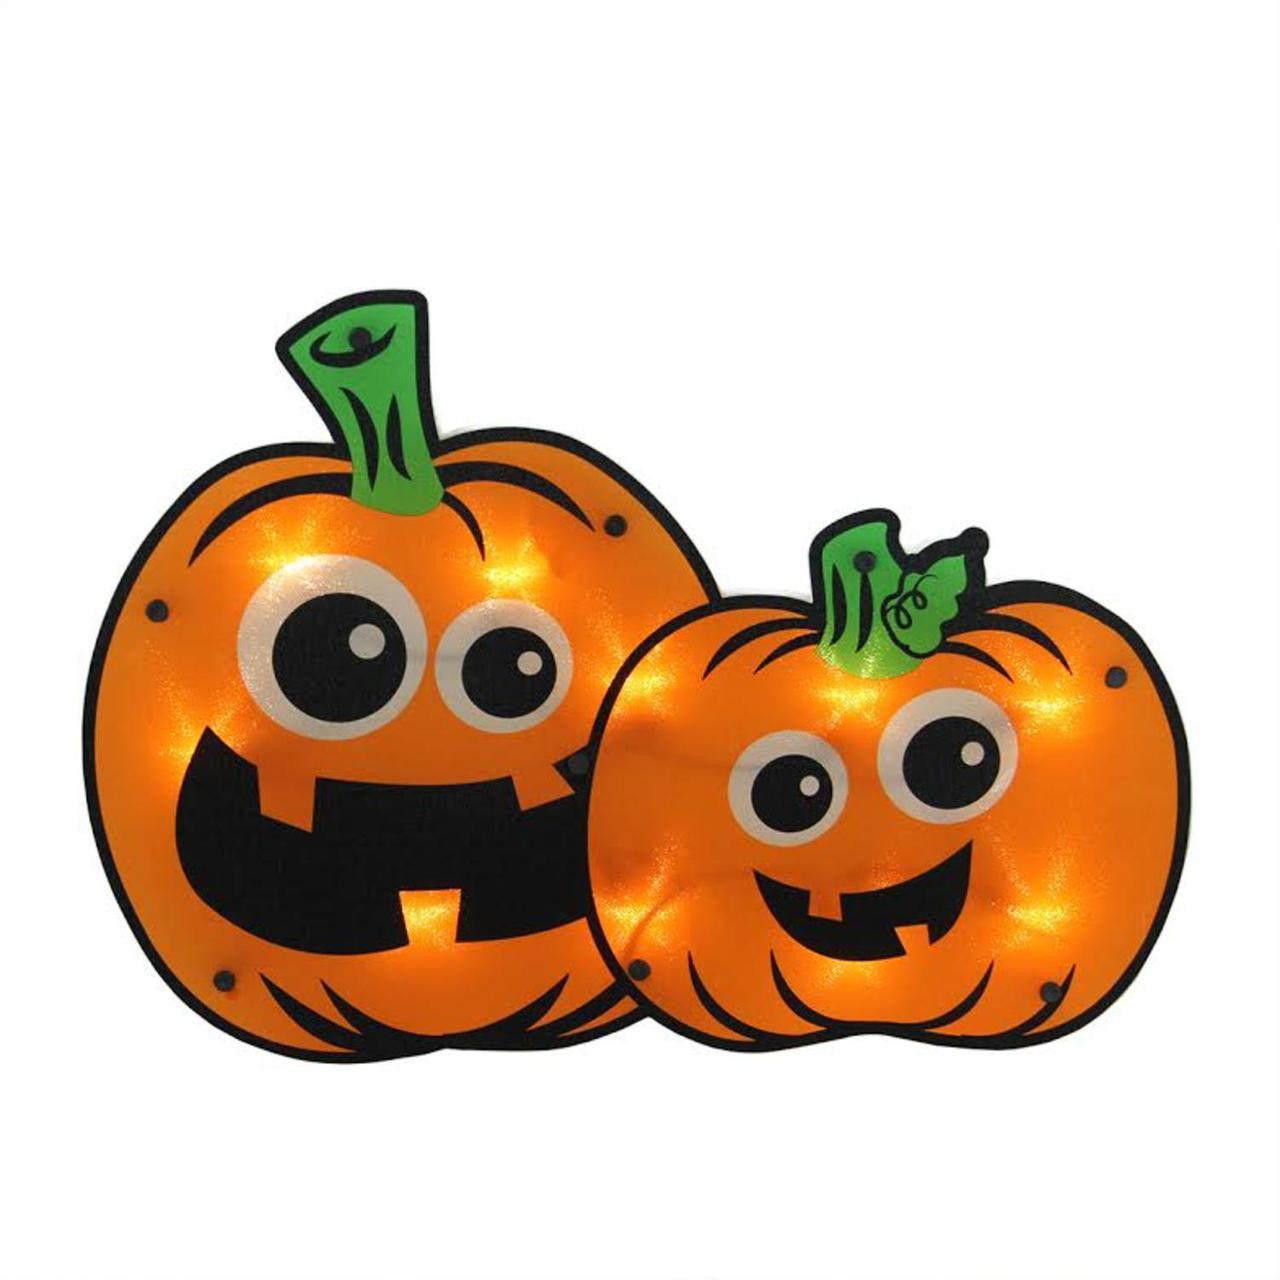 1280x1280 16.25 Lighted Jack O Lantern Pumpkin Couple Halloween Window